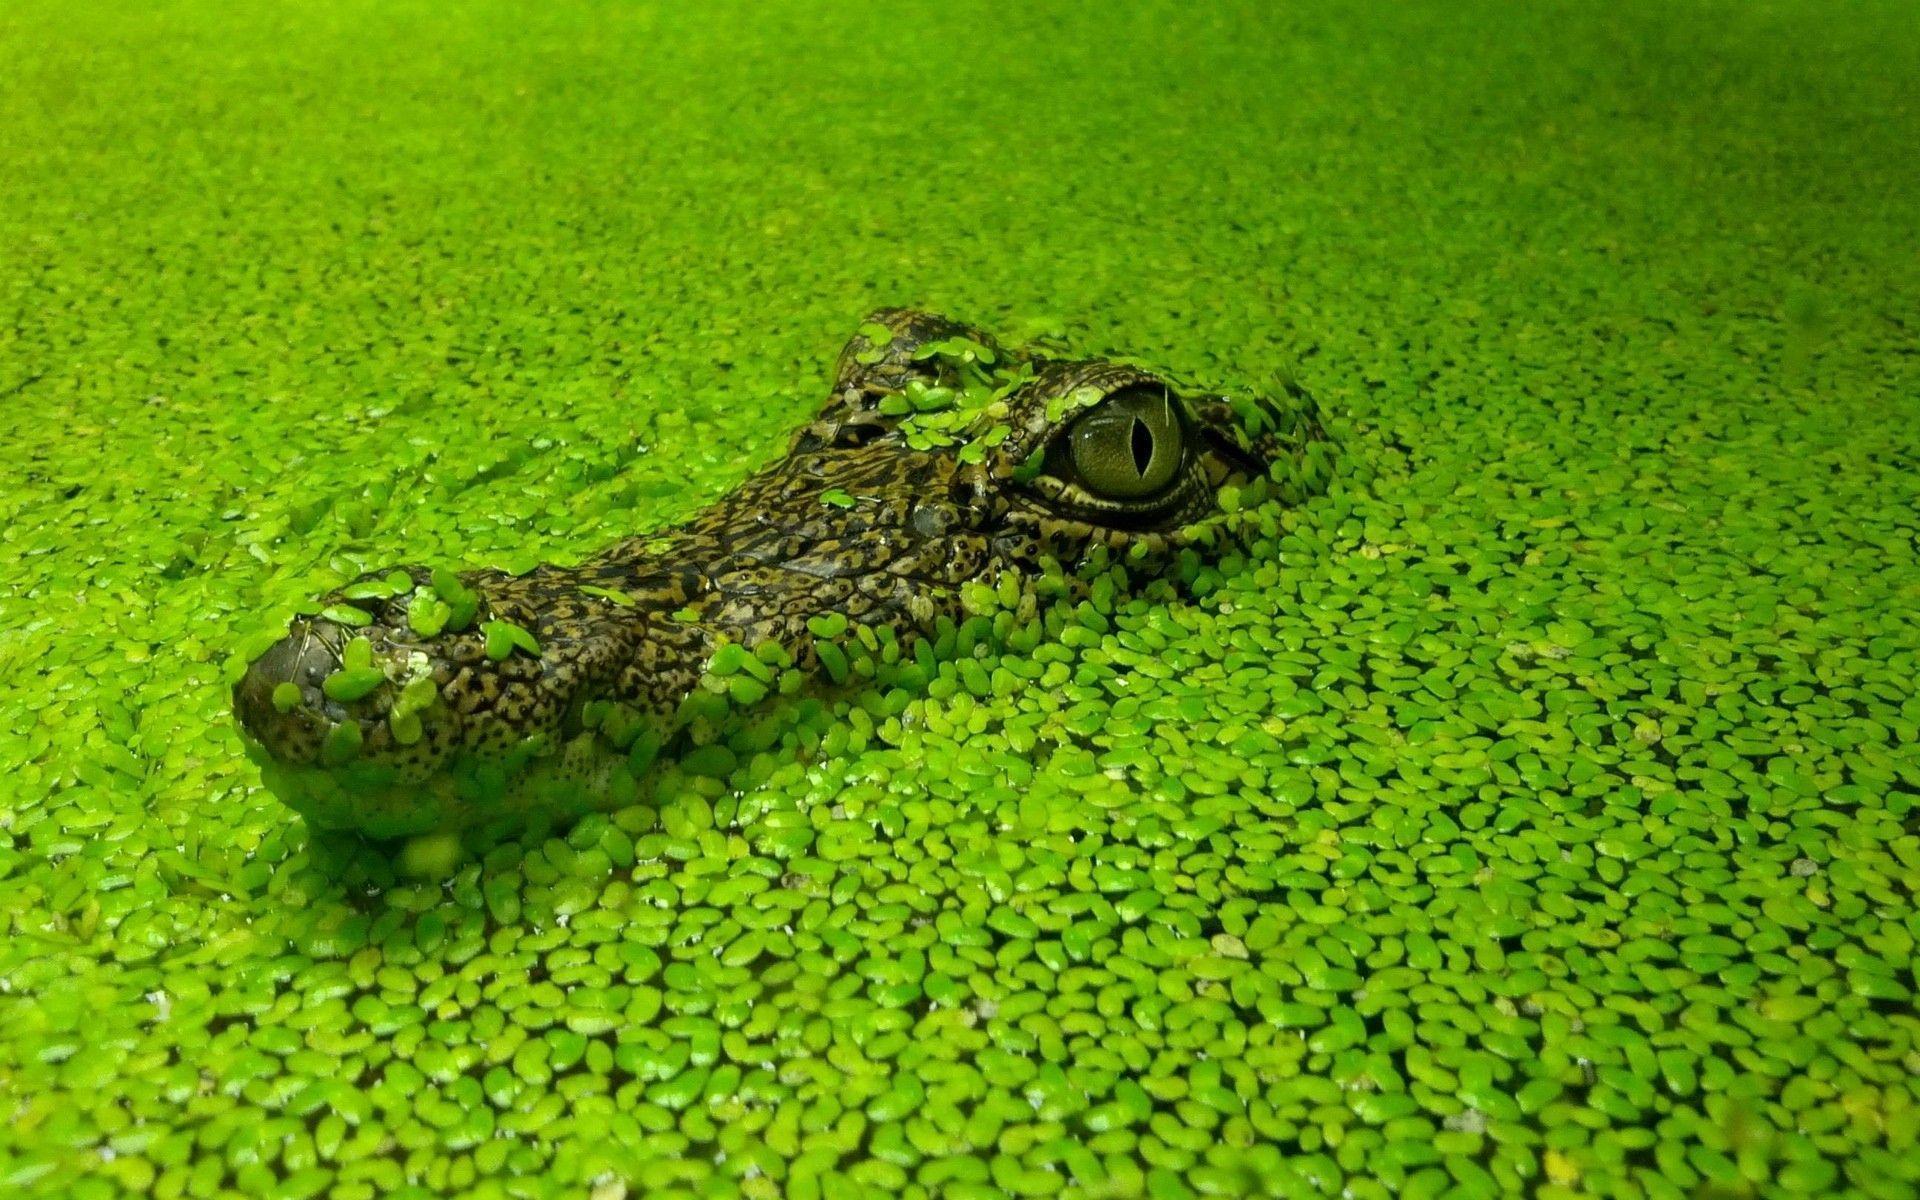 Alligator Wallpapers - Wallpaper Cave